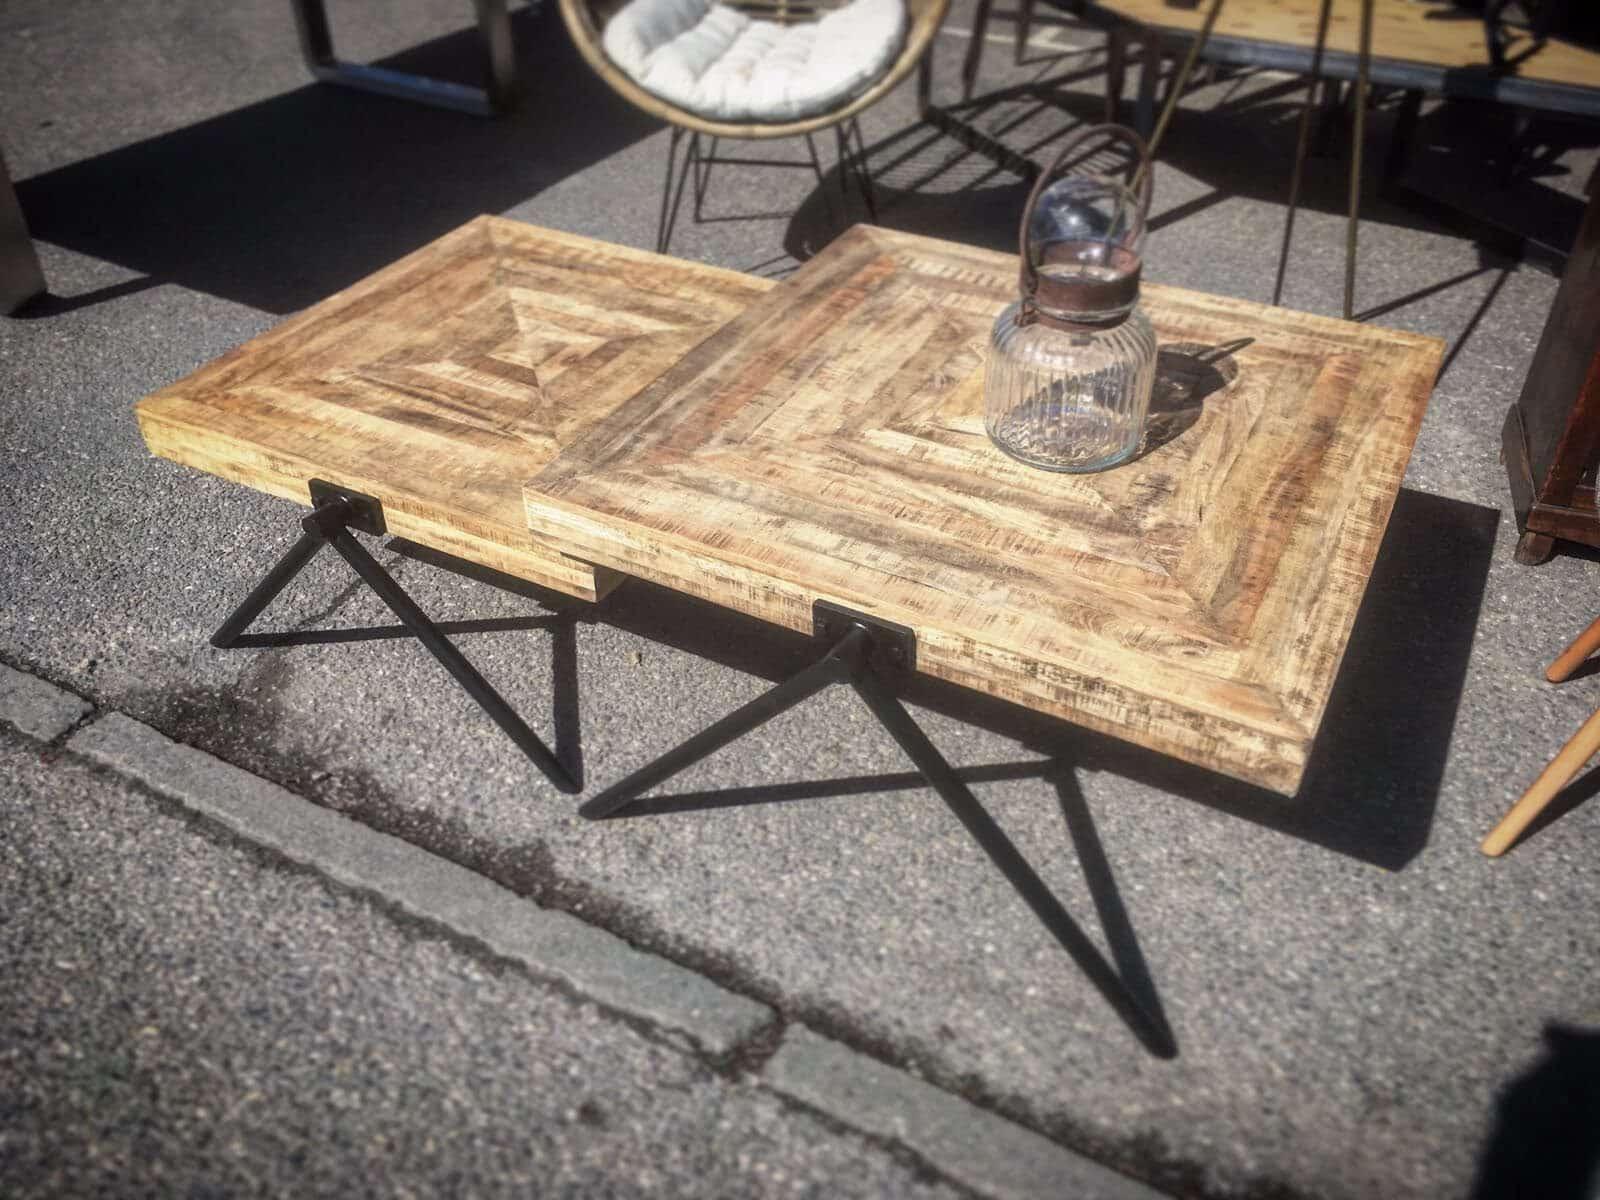 table basse gigogne carr e bois m tal cr ation sur mesure. Black Bedroom Furniture Sets. Home Design Ideas